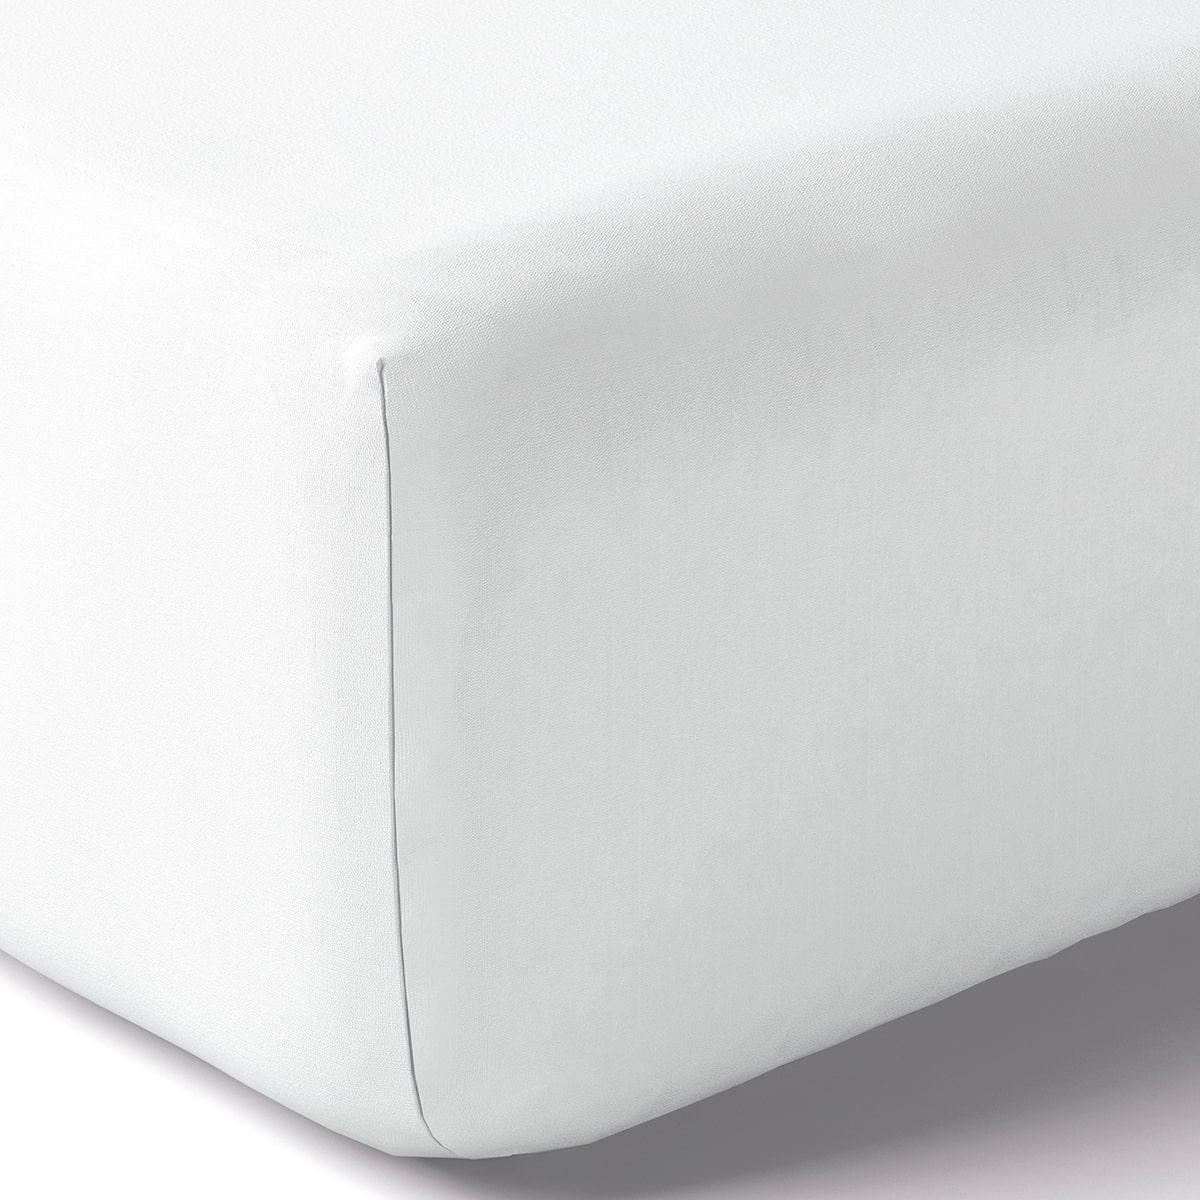 Drap housse coton 180x200 cm blanc